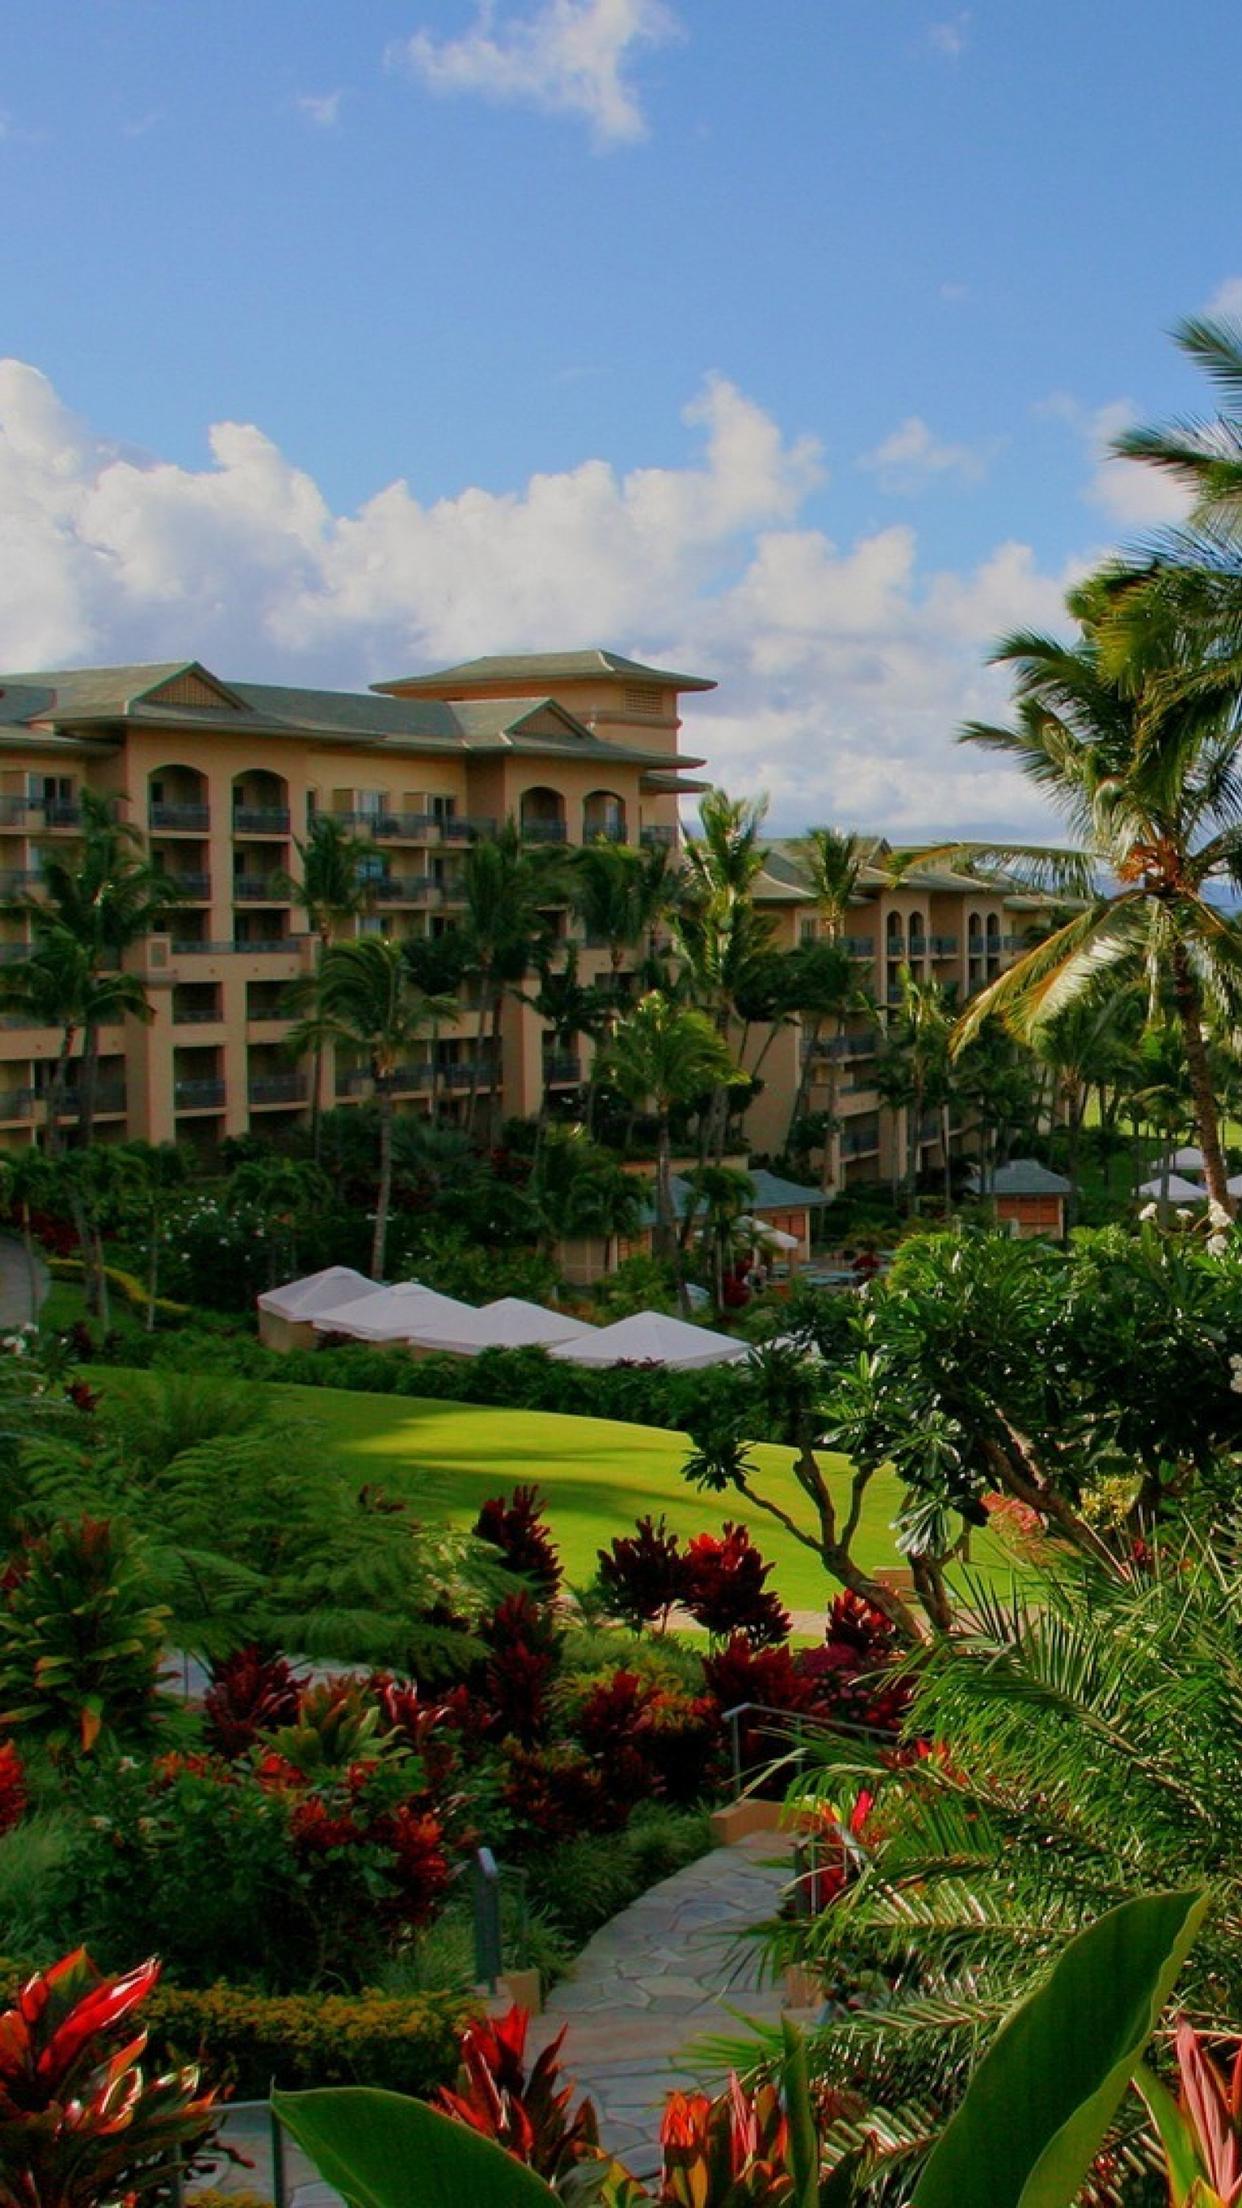 Hawaii Hotel 3Wallpapers iPhone Parallax 3Wallpapers : notre sélection de fonds décran du 14/07/2017